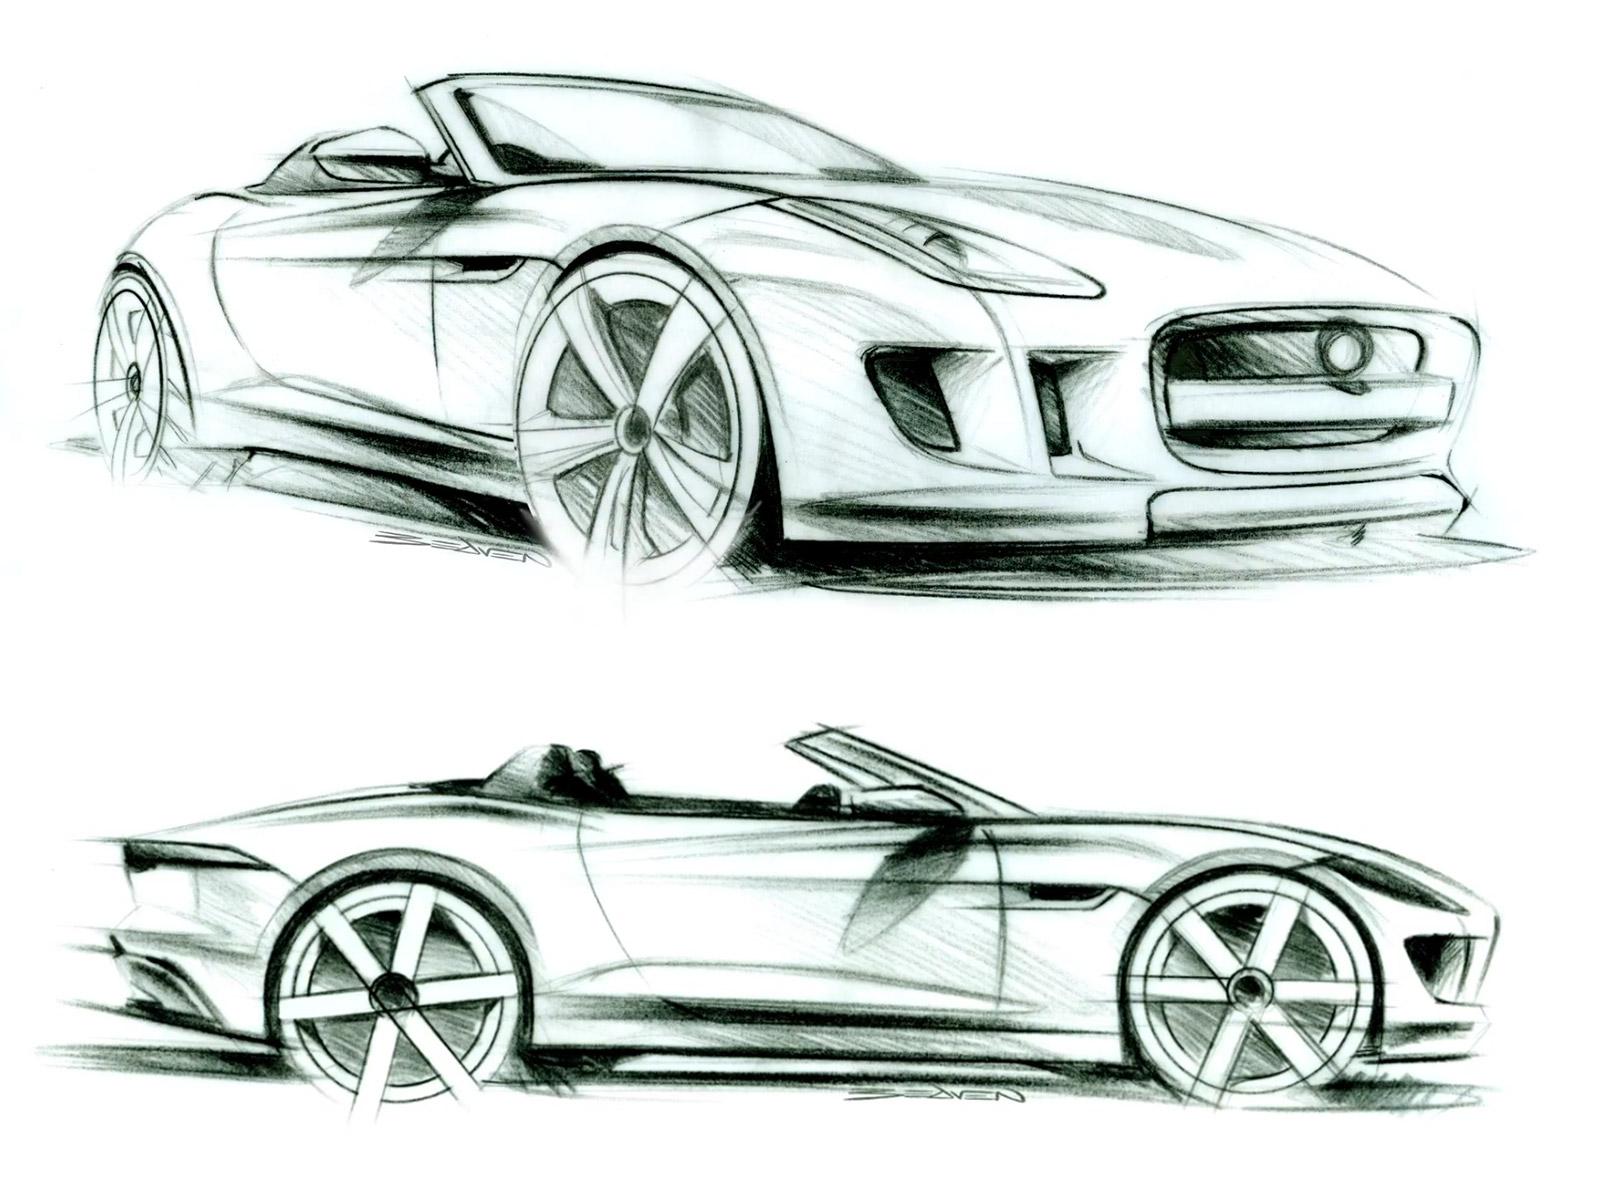 Drawn vehicle car design  F sketch sketches Design